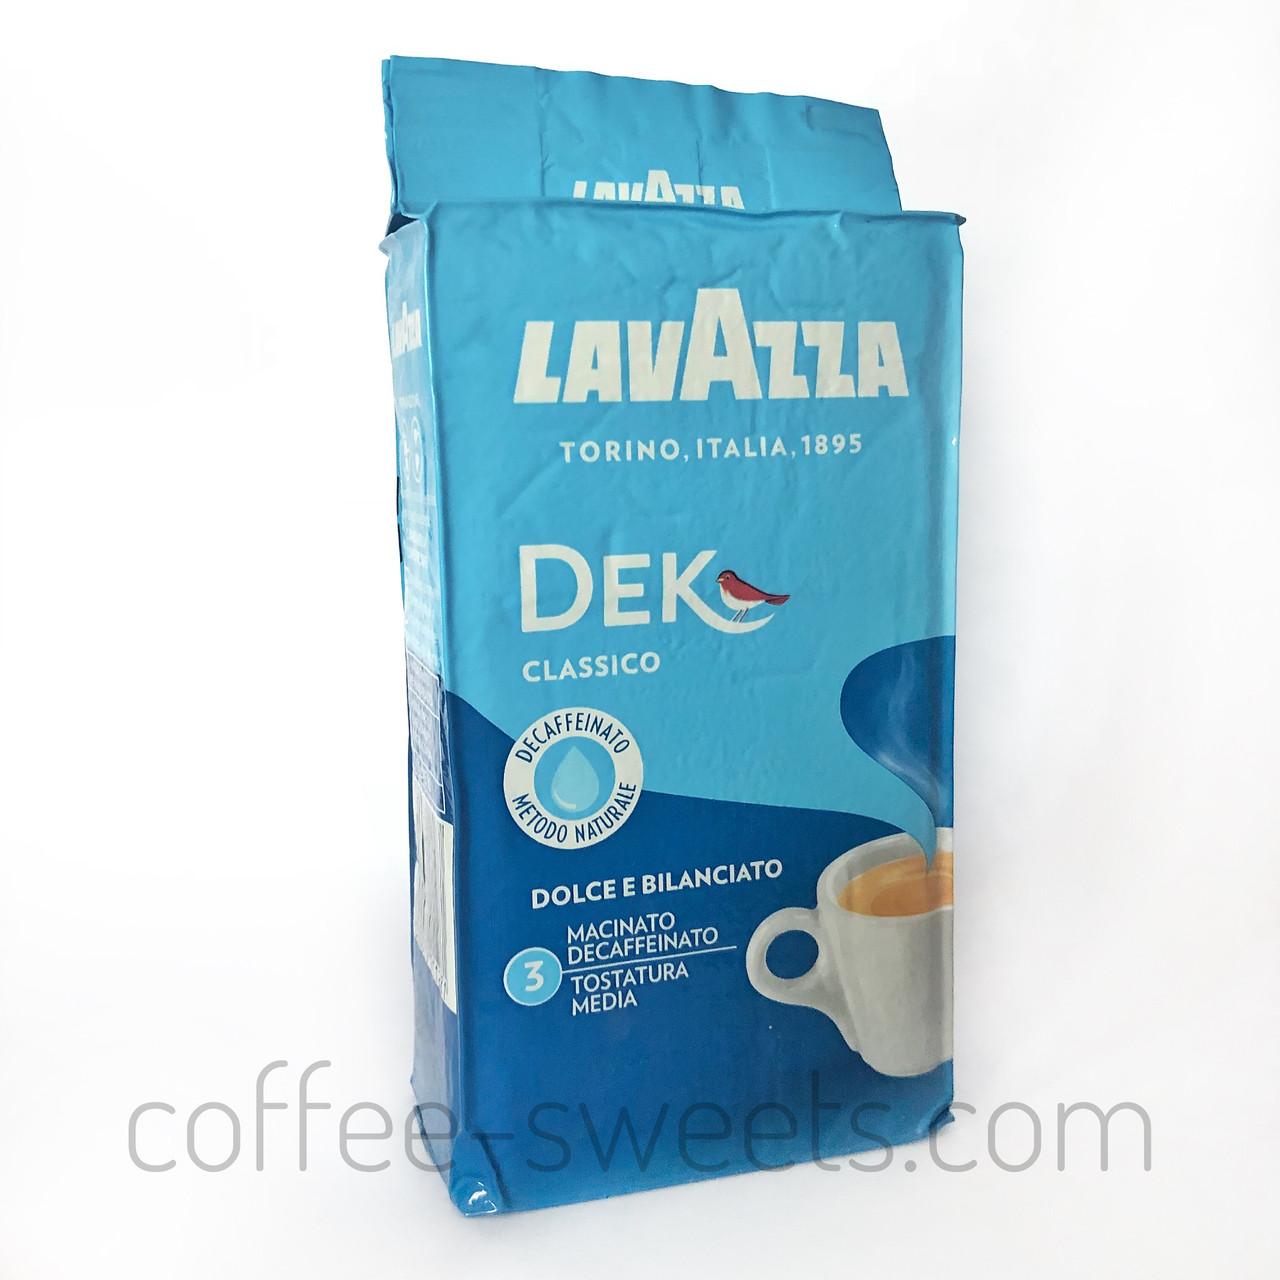 Кофе молотый Lavazza Dek Classico 250g БЕЗ КОФЕИНА